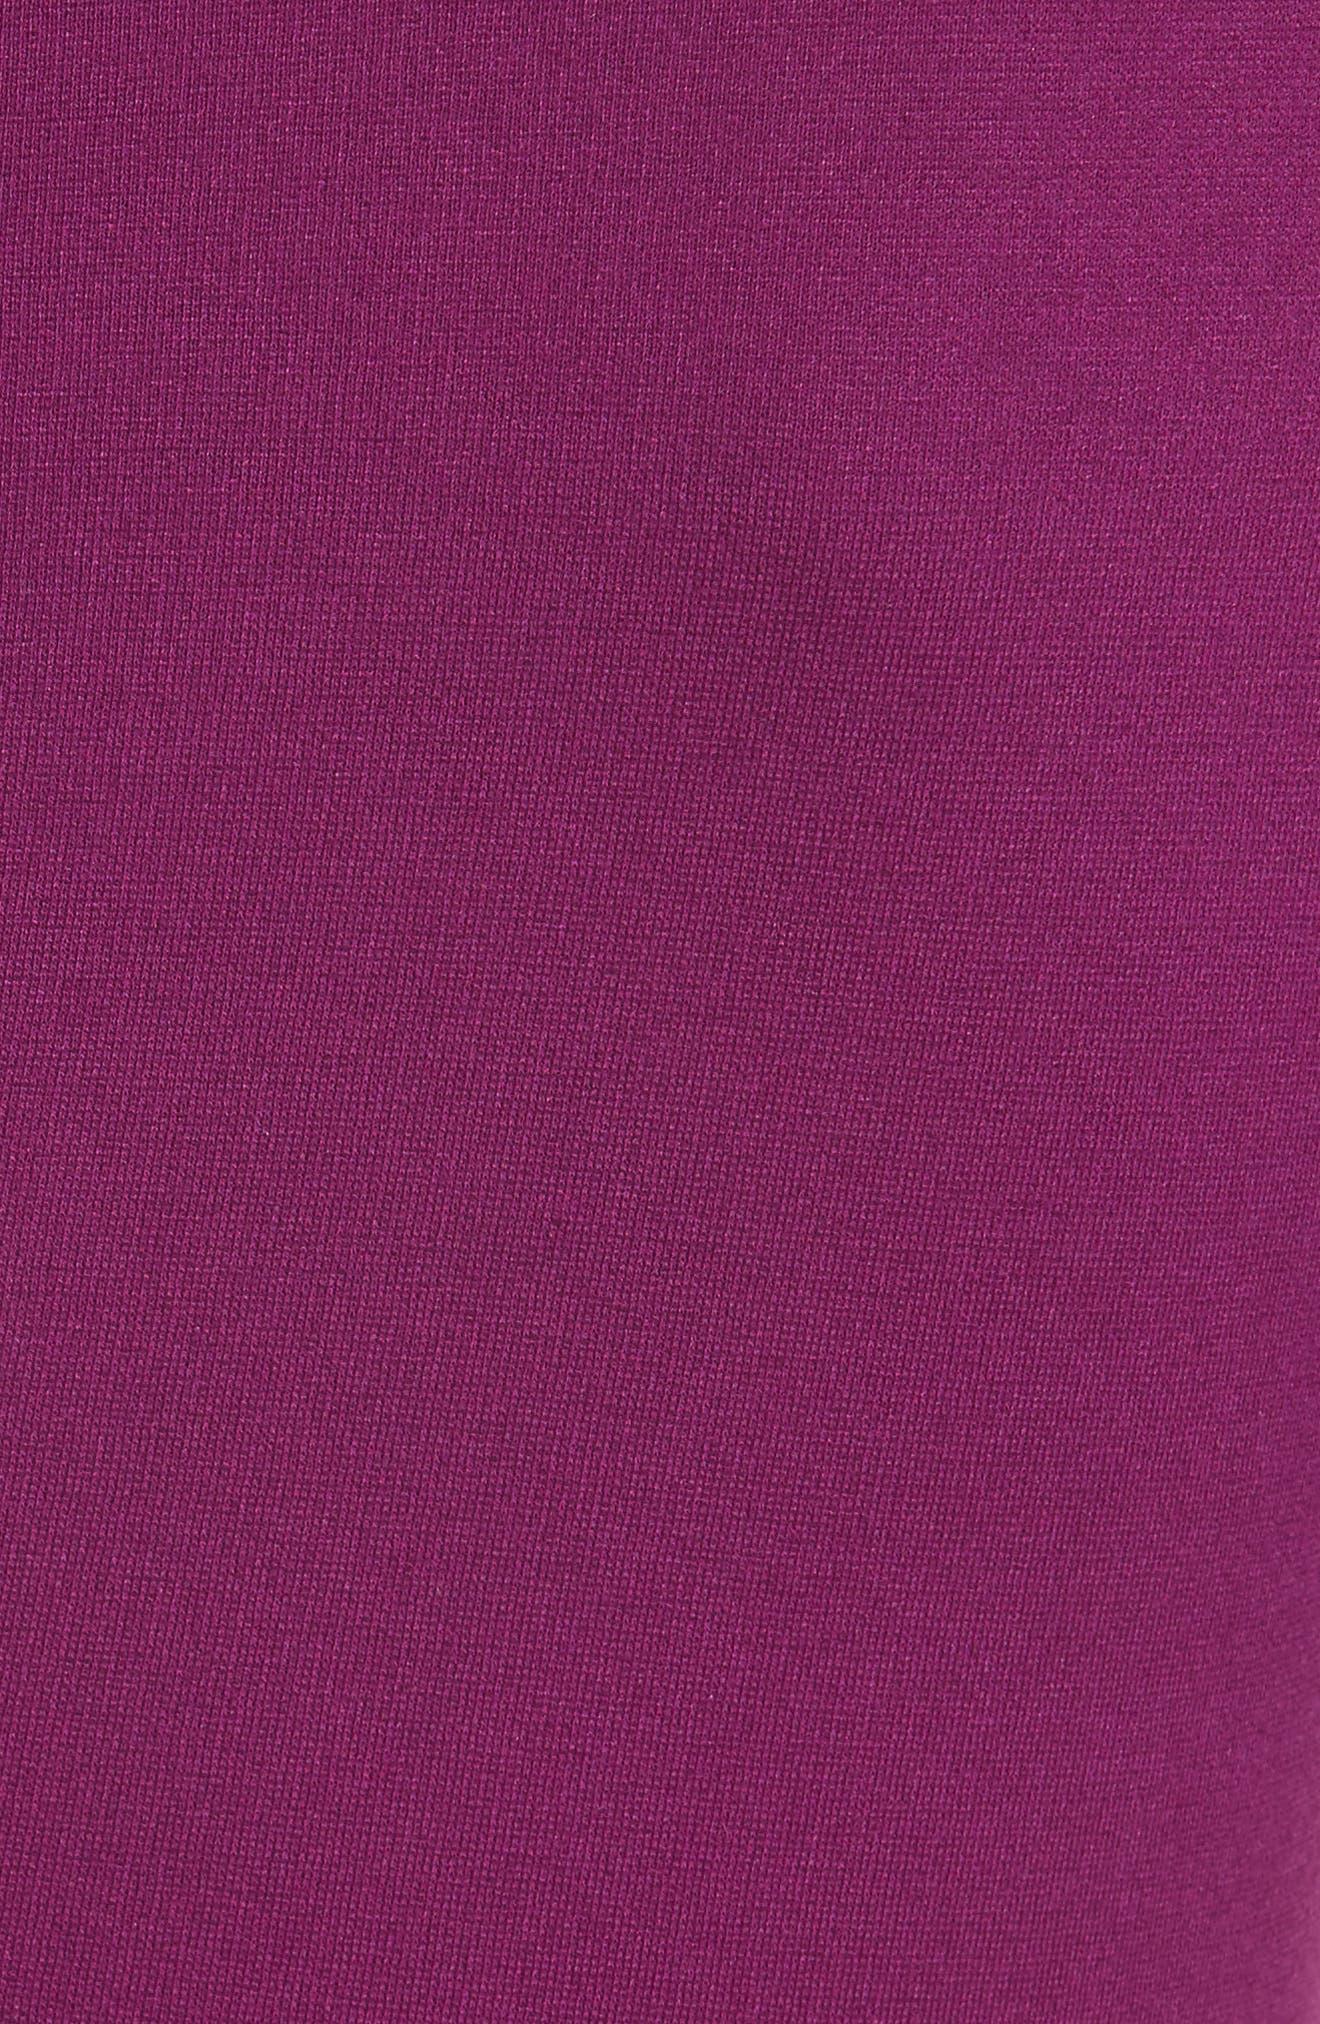 Alternate Image 3  - Armani Collezioni Milano Jersey Petal Hem Dress (Nordstrom Exclusive)